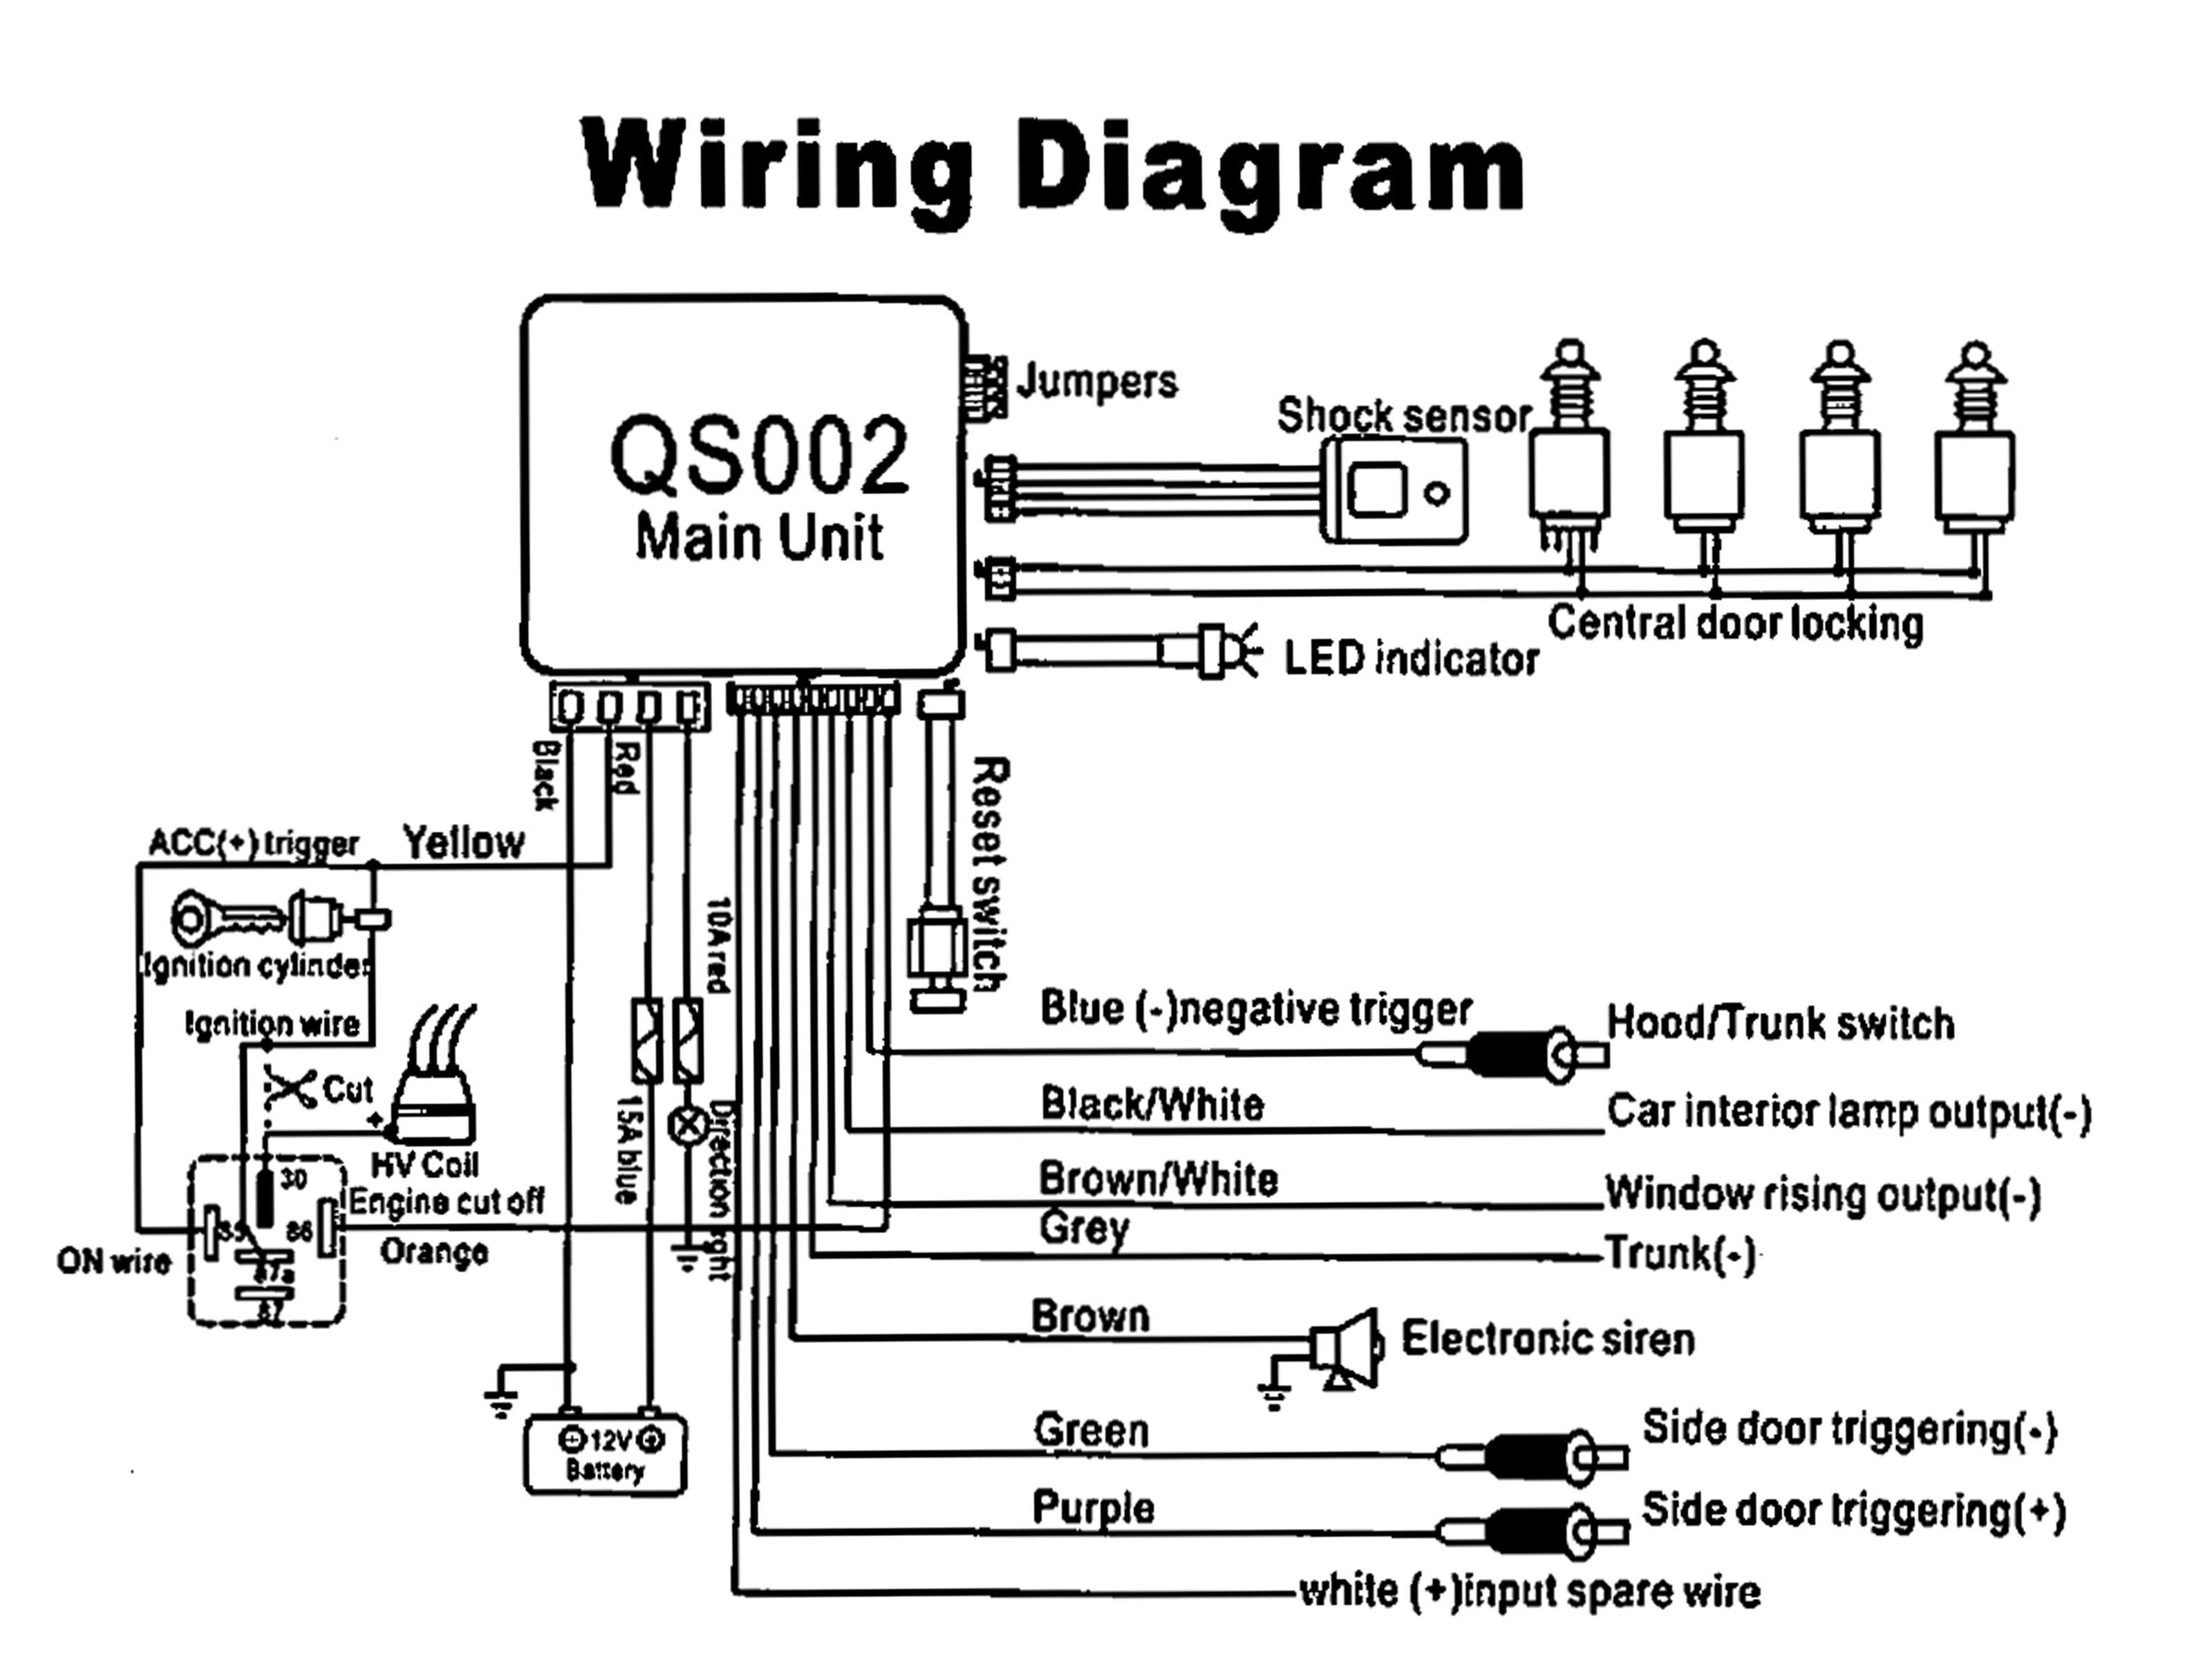 avs 3010 car alarm wiring diagram